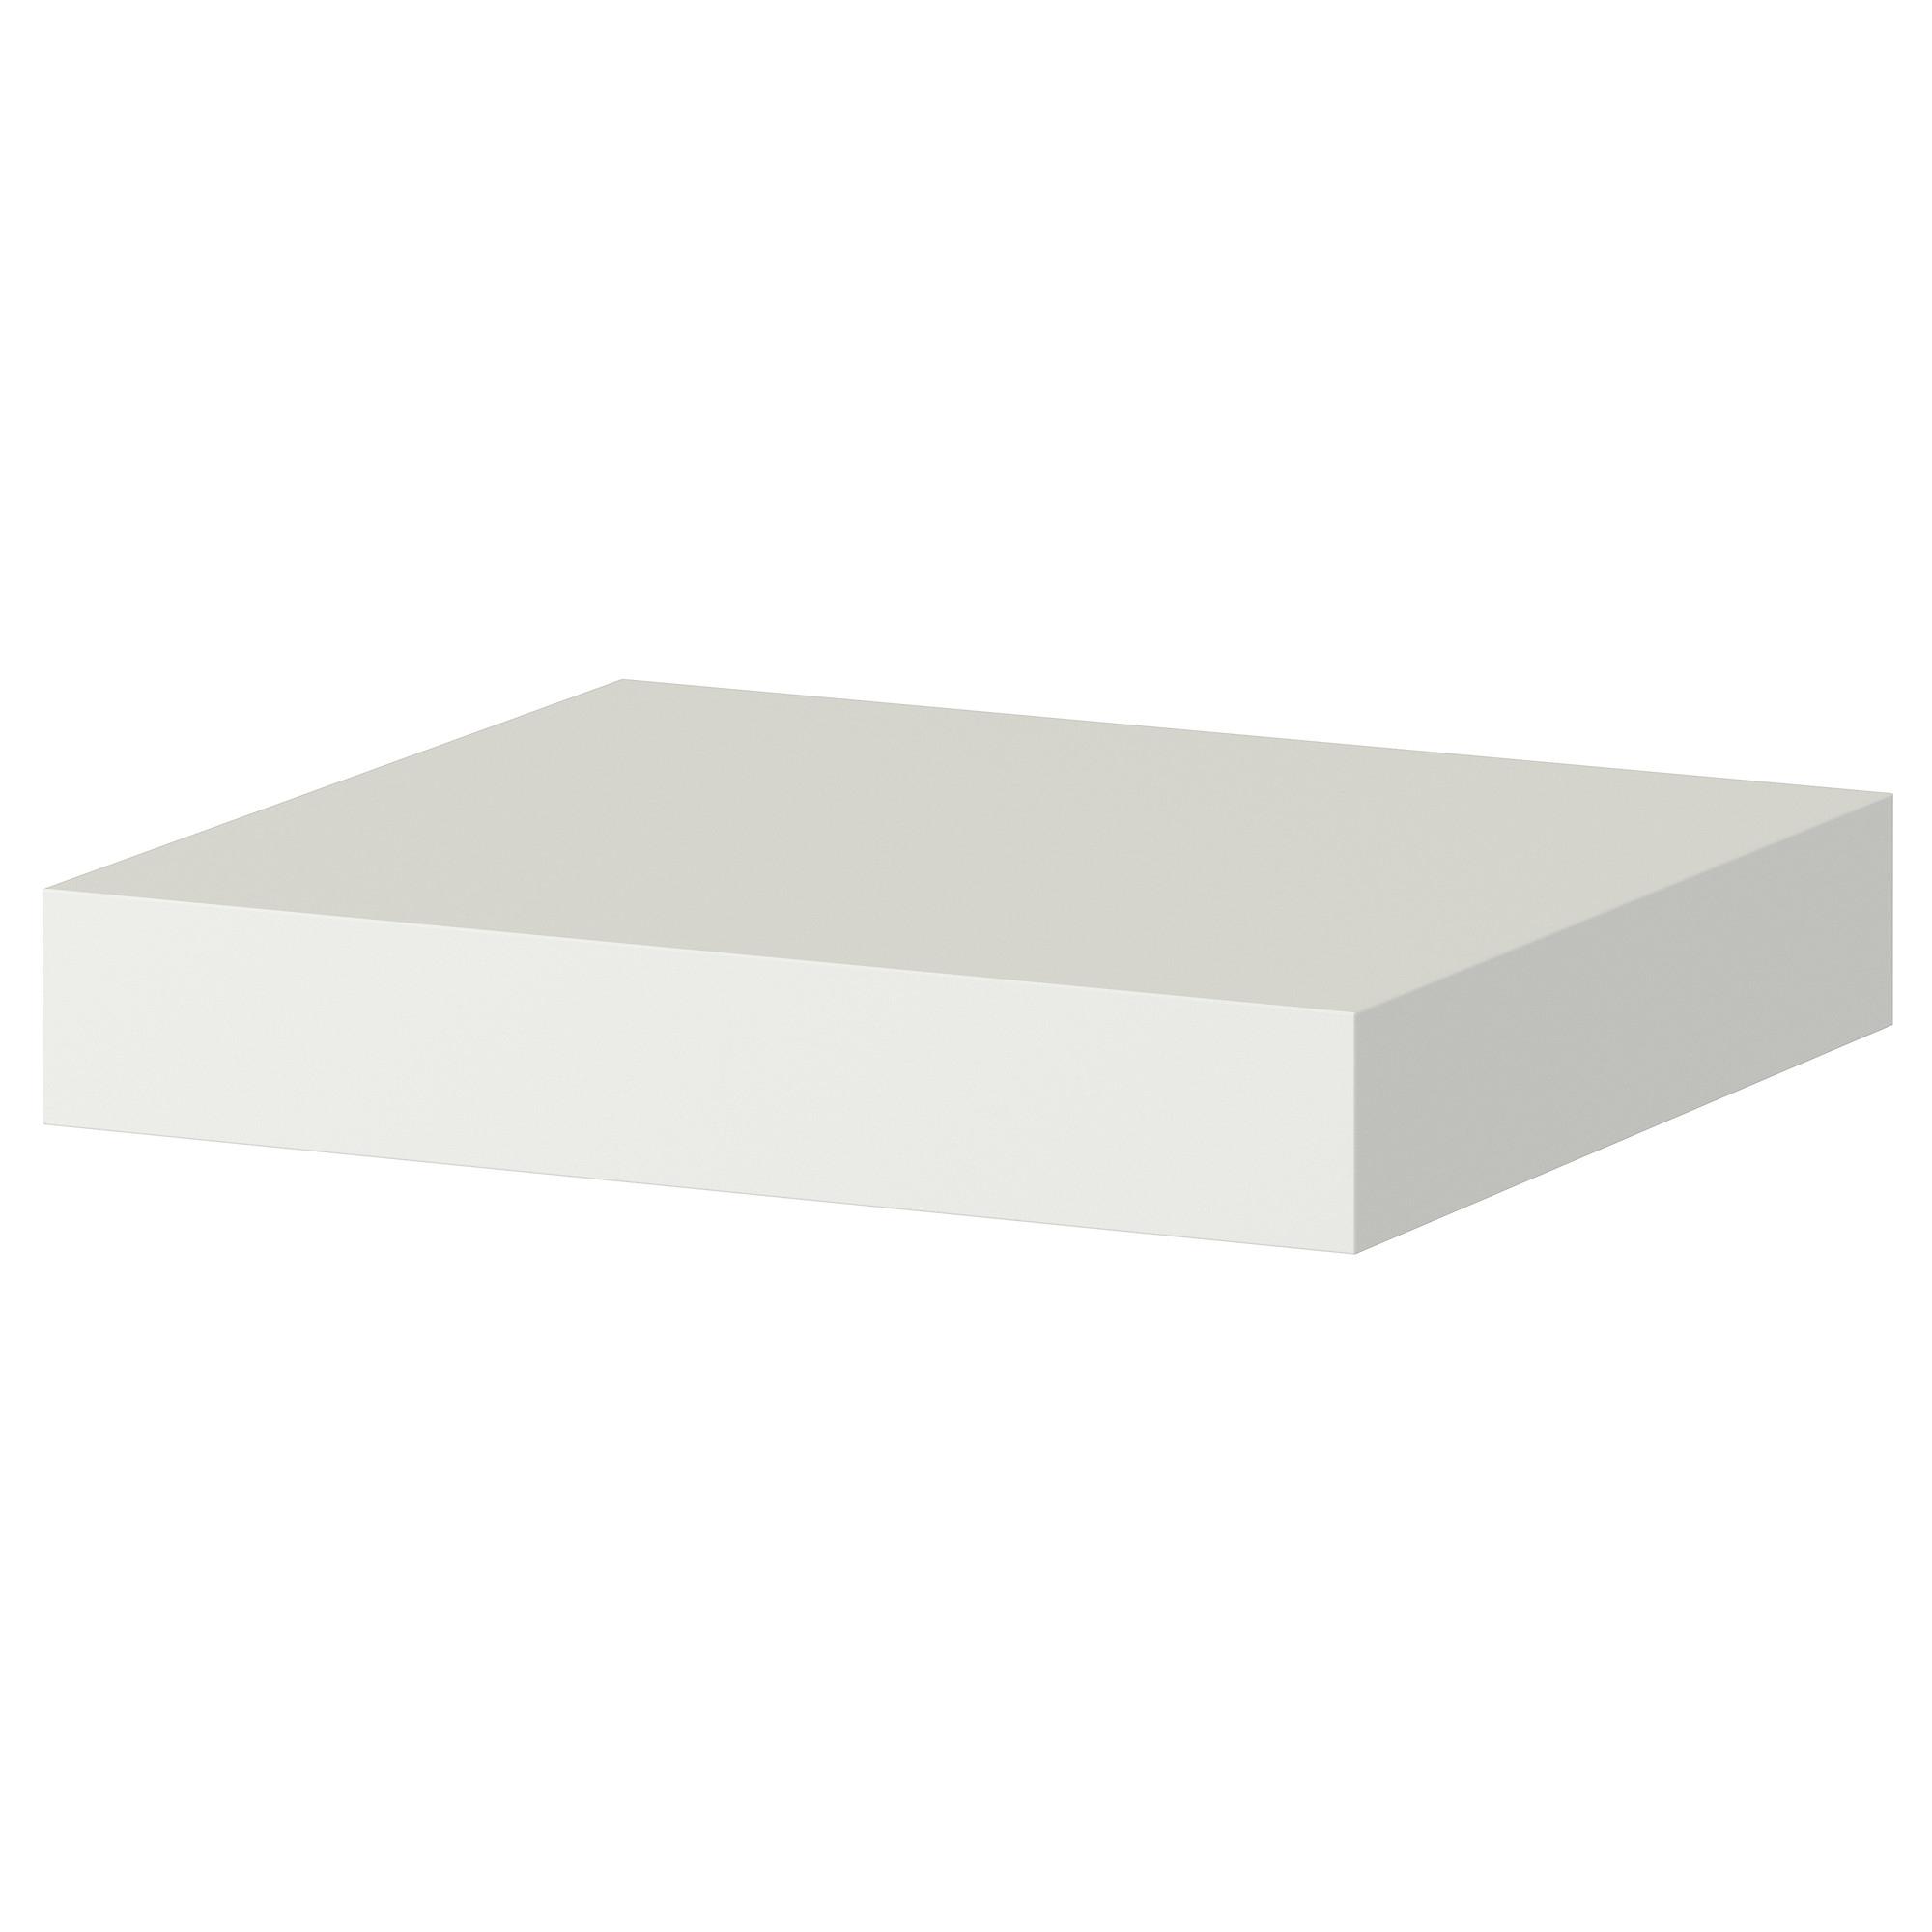 Lack Wall Shelf White Ikea Regarding White Wall Shelves (#5 of 15)